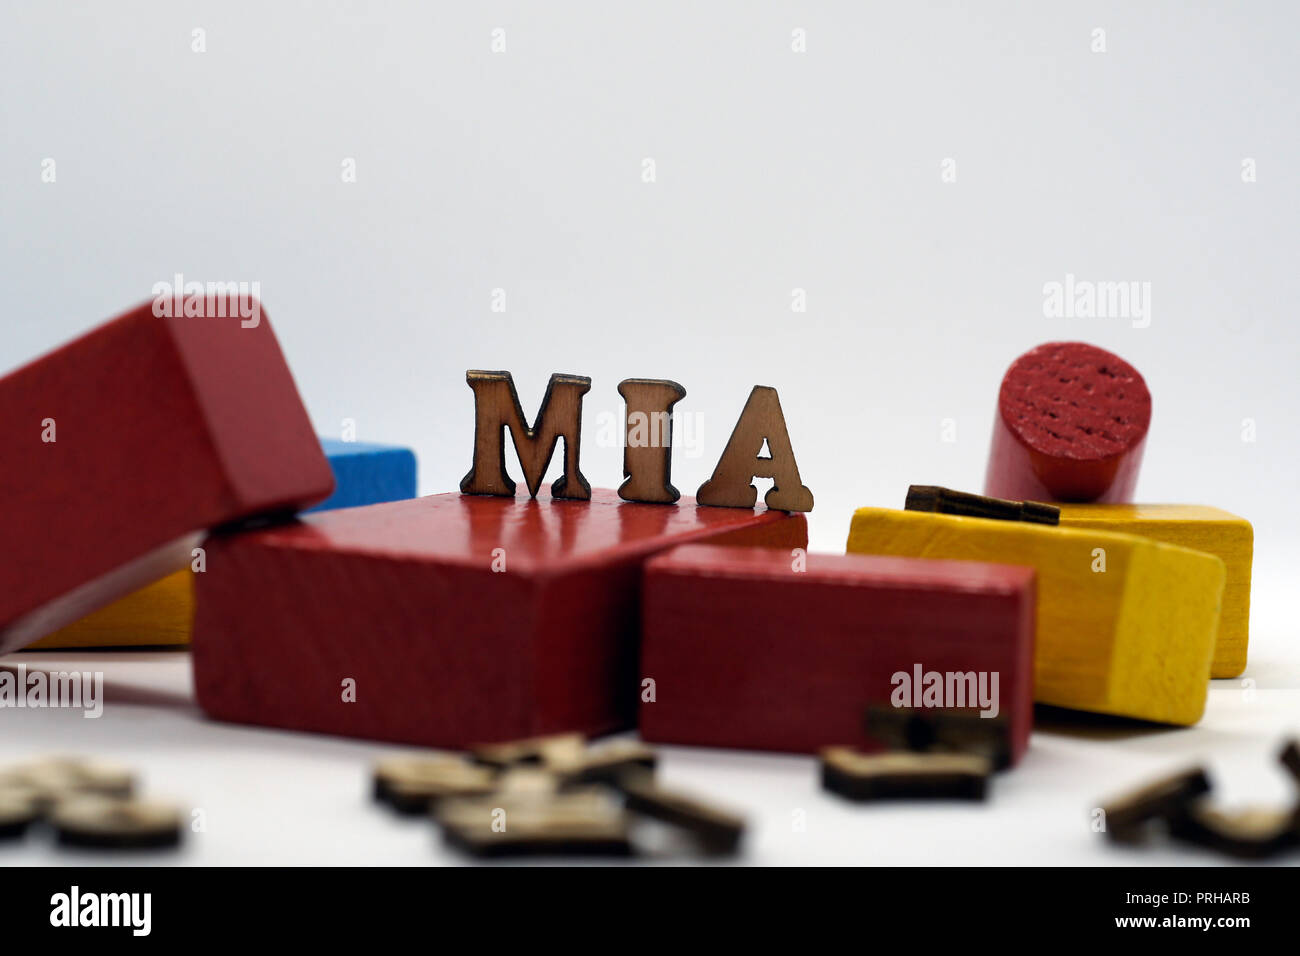 popular female first name mia - Stock Image